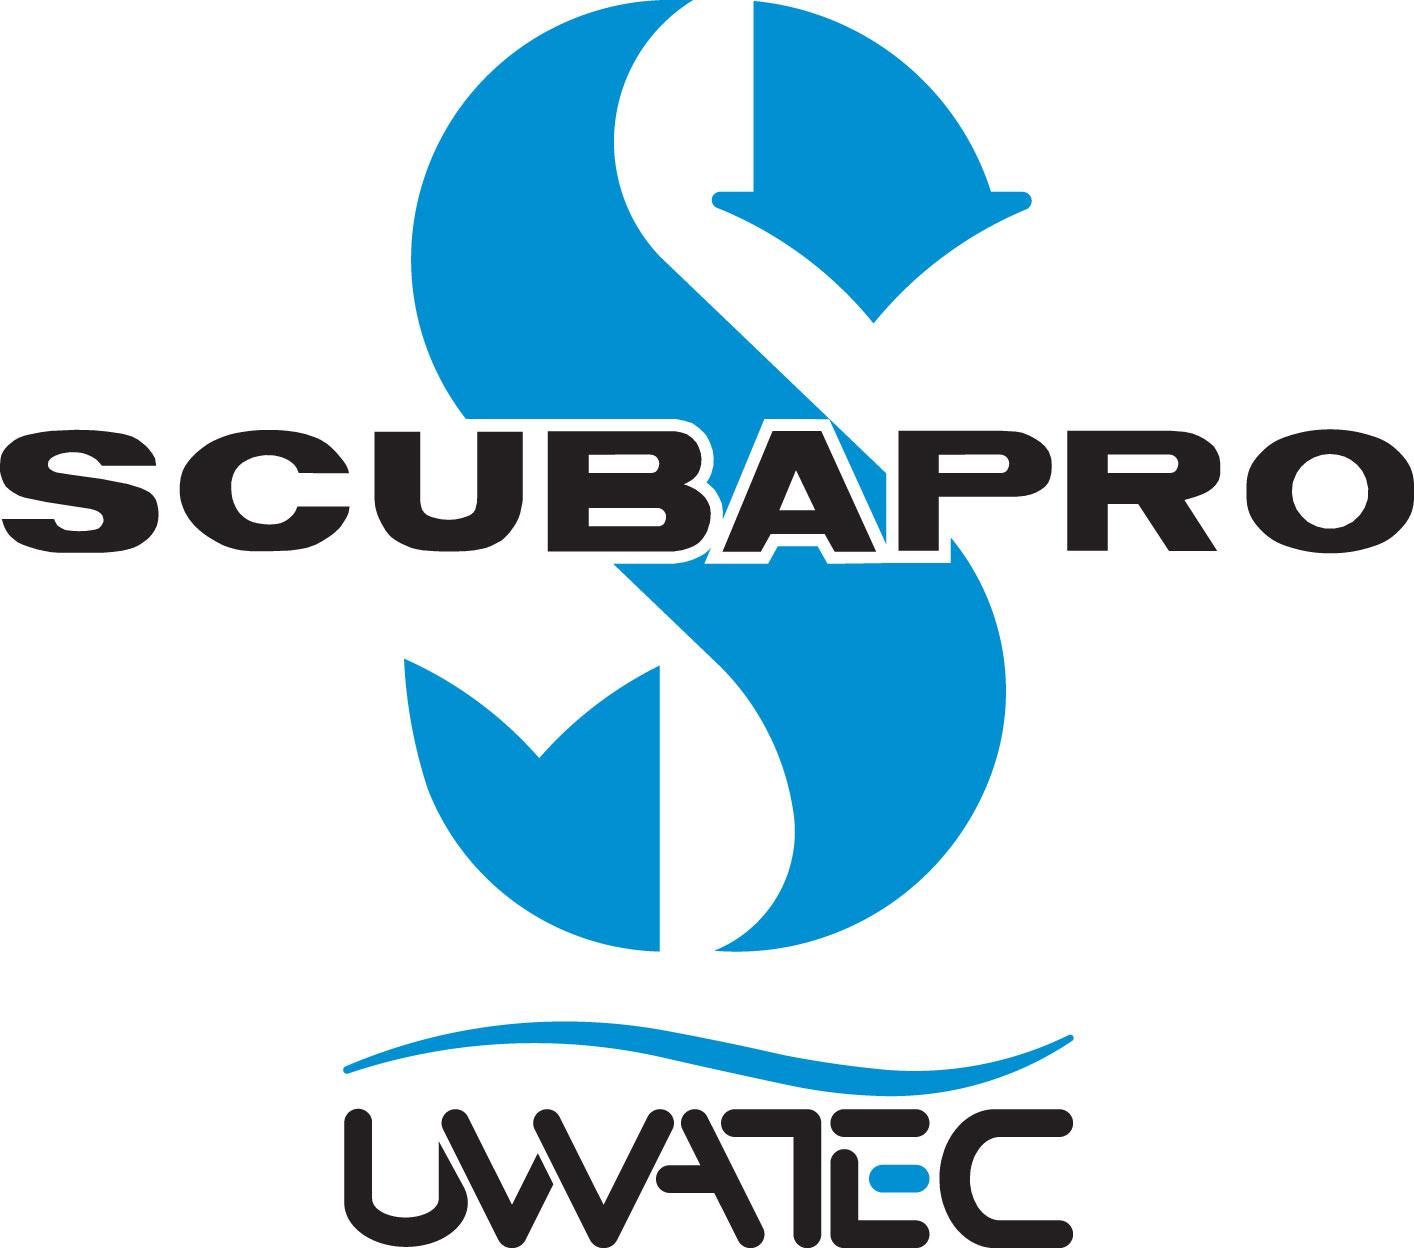 scubapro_uwatec_brand_logo.jpg